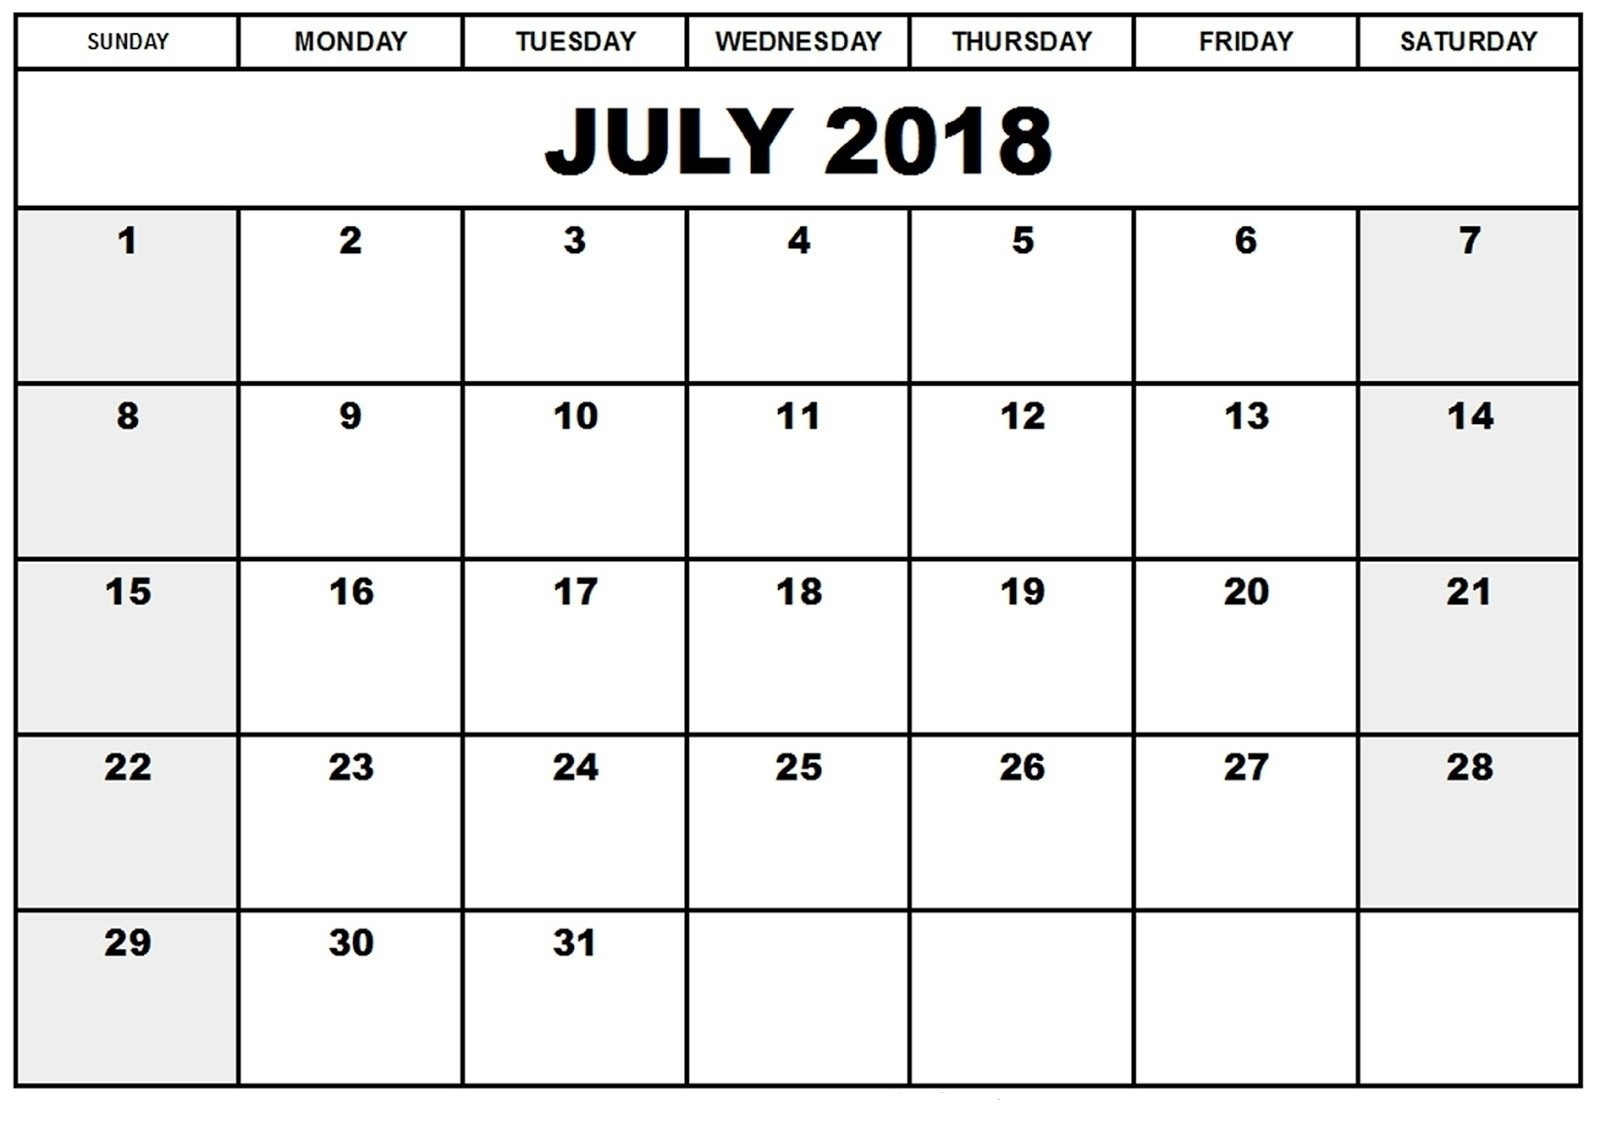 Pregnancy Calendar Dayday | Blank Calendar Template Blank Time And Calendar Template Date And Time